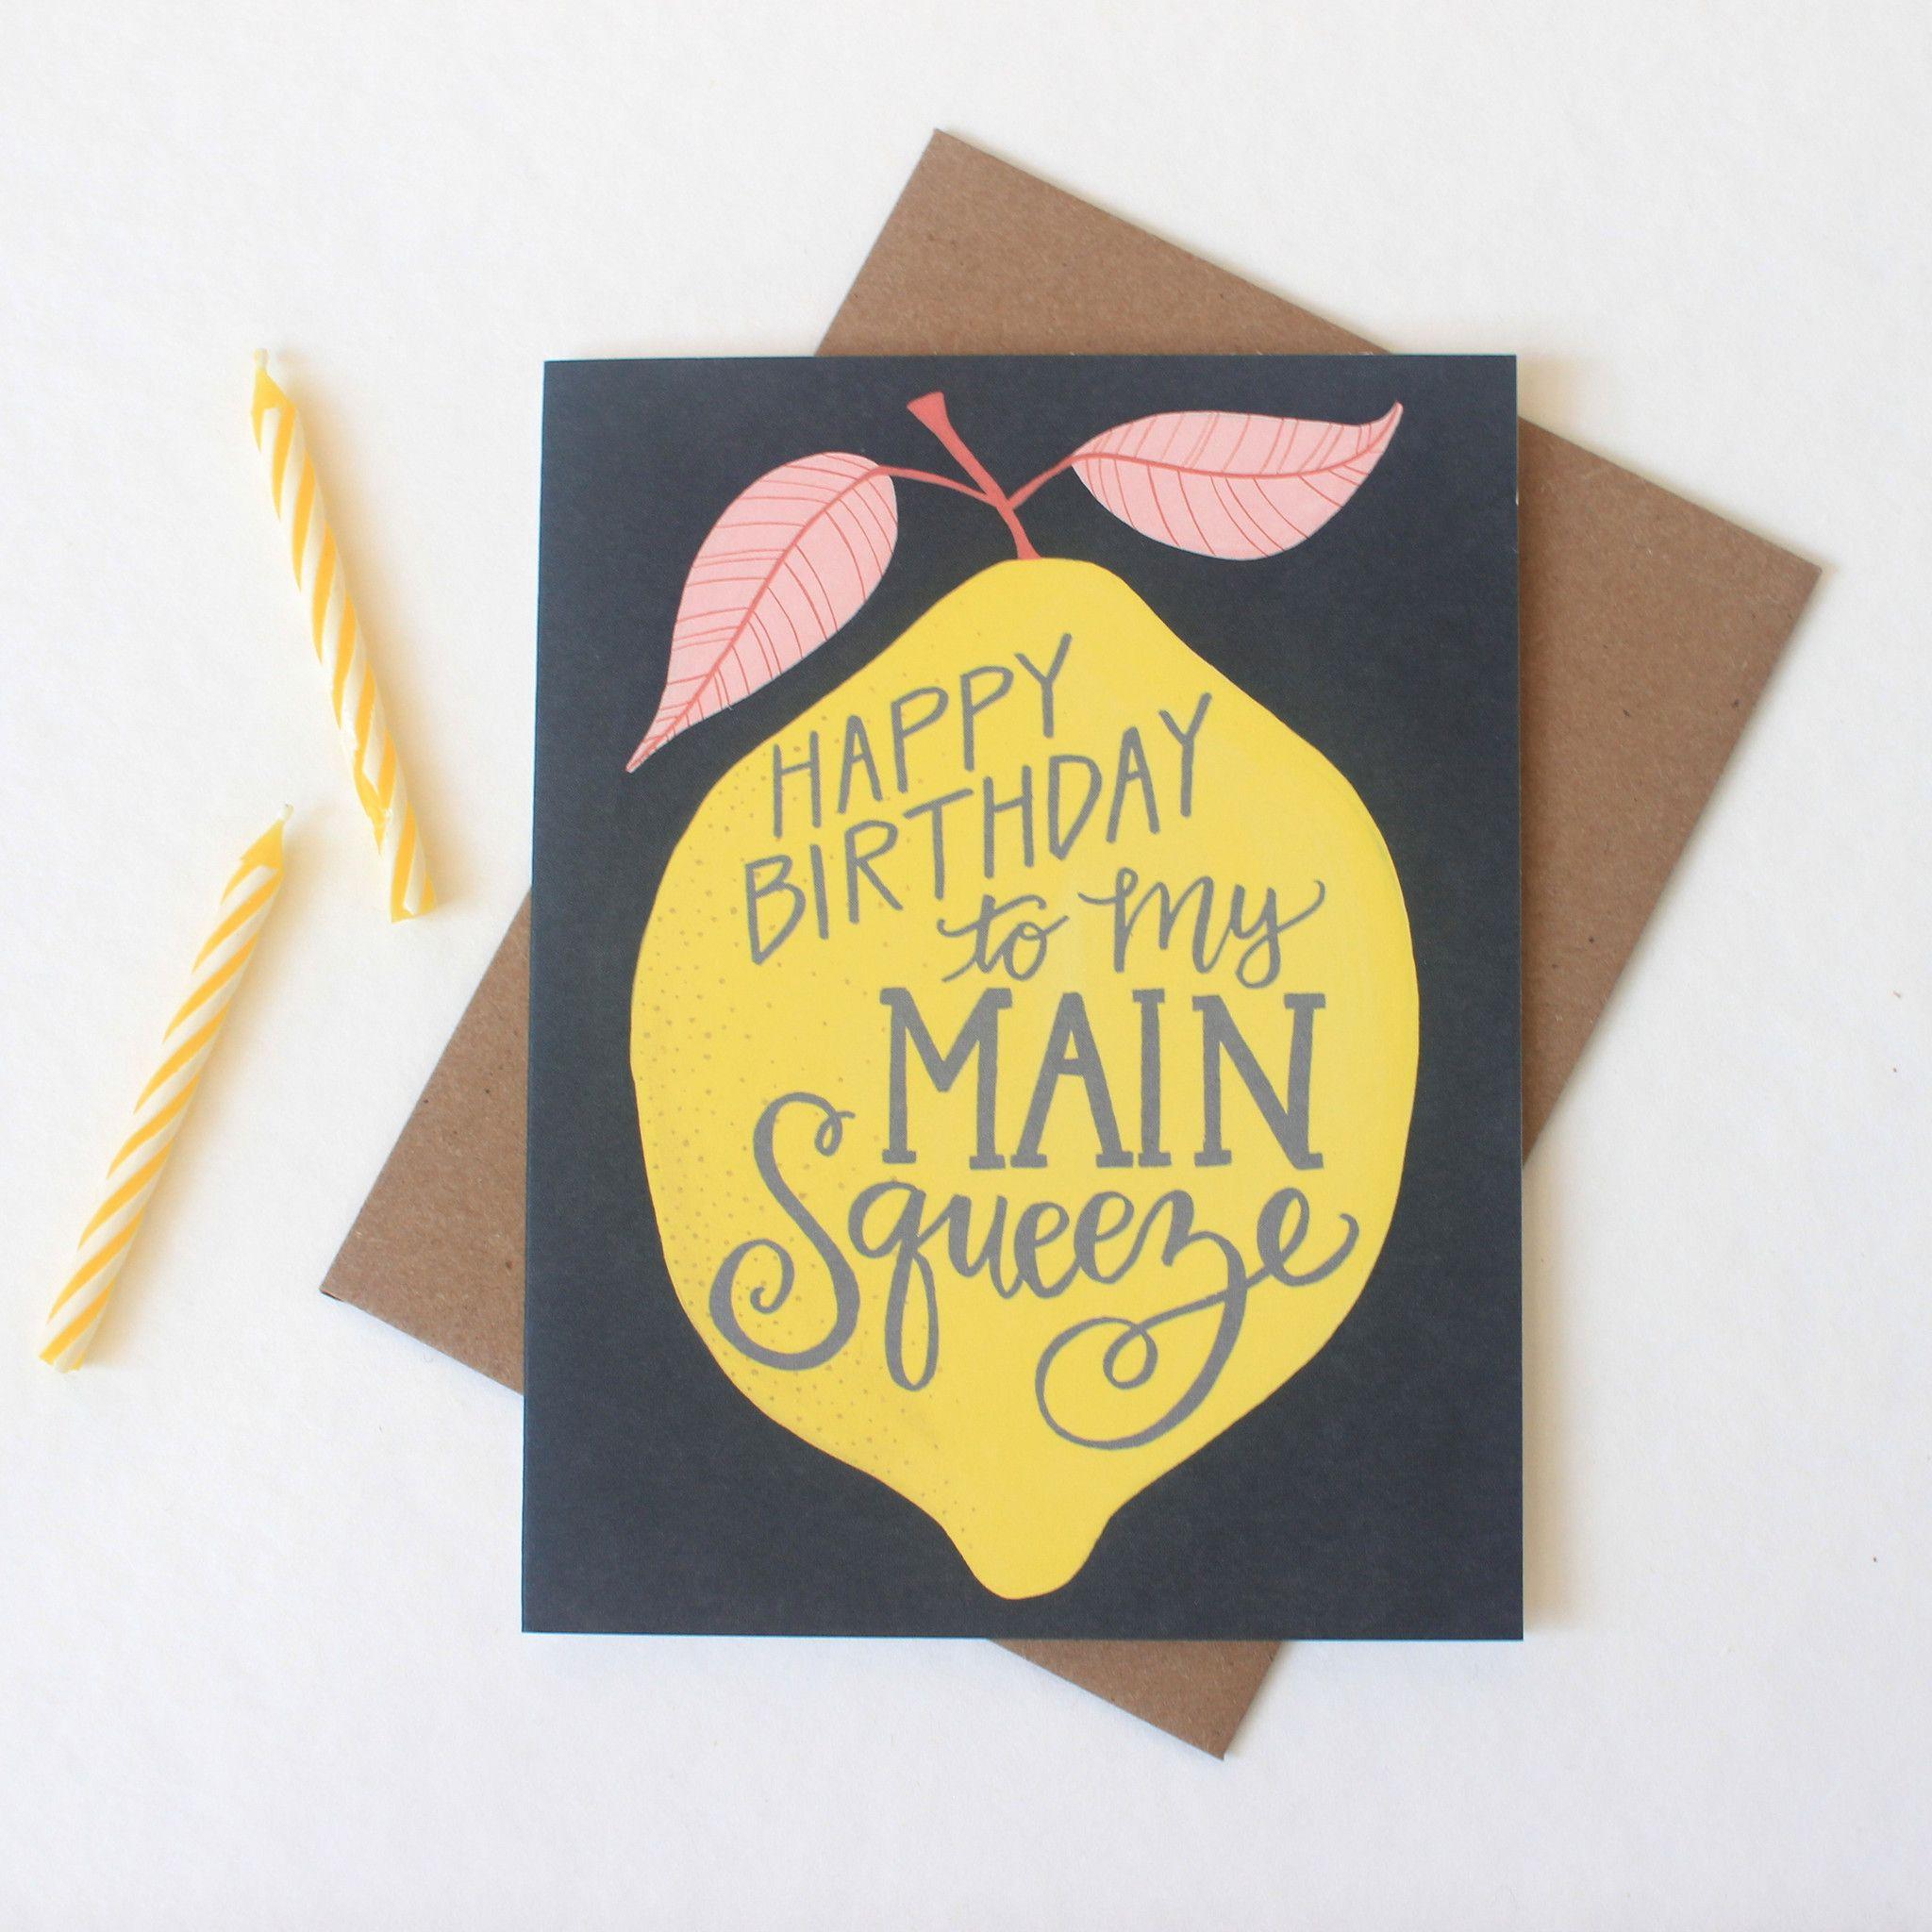 Happy Birthday My Main Squeeze Card Homemade Birthday Cards Birthday Cards For Boyfriend Punny Cards